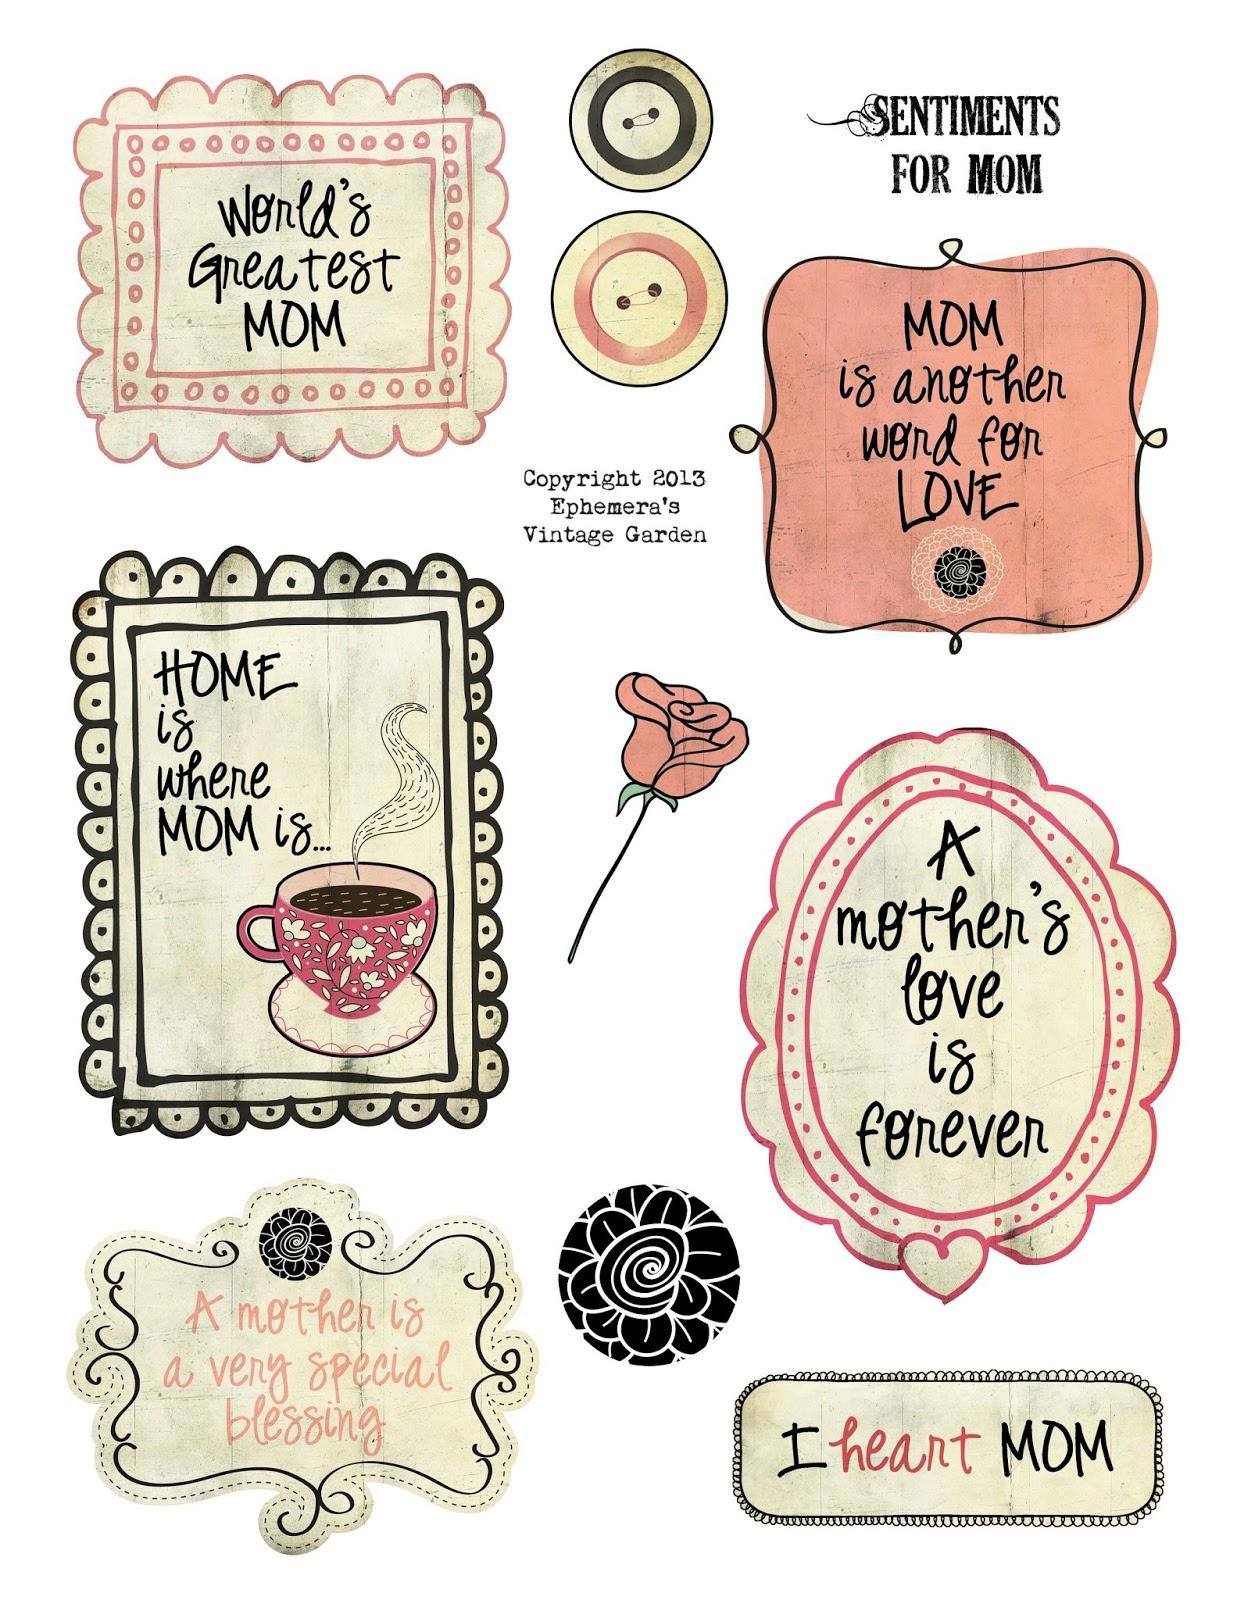 Ephemeras Vintage Garden: Free Printable - Doodle Sentiments For Mom